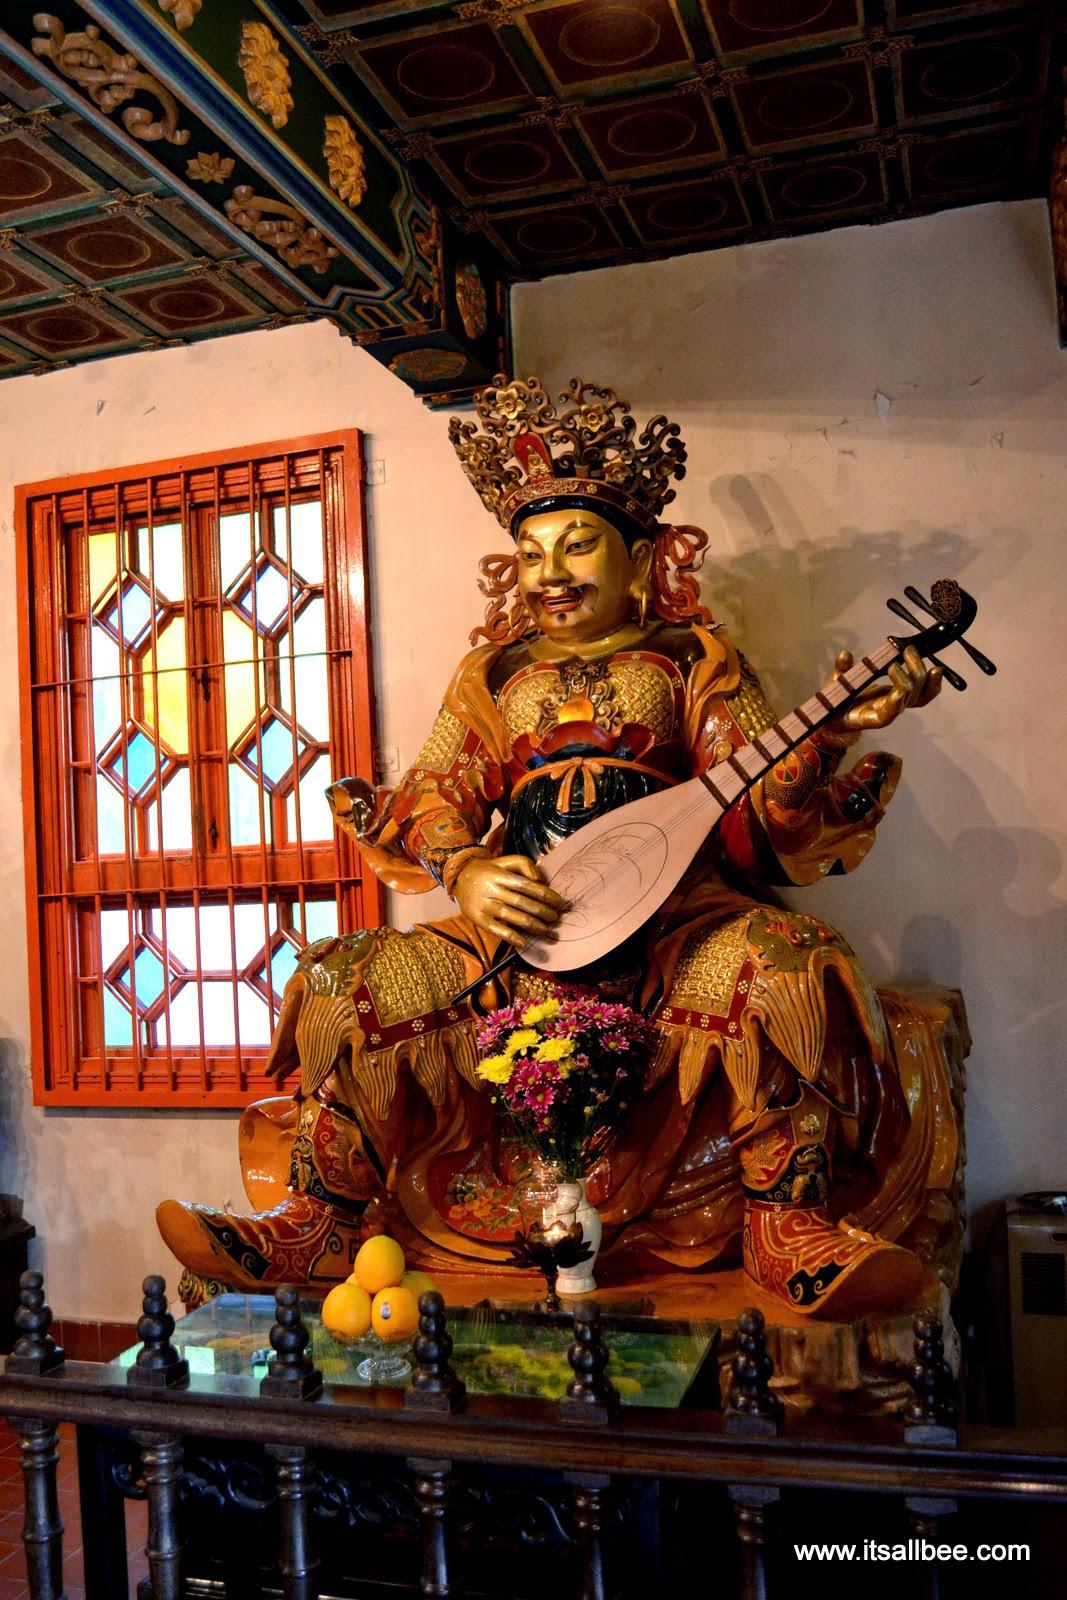 lantau island hk | Big Buddha | Monastery